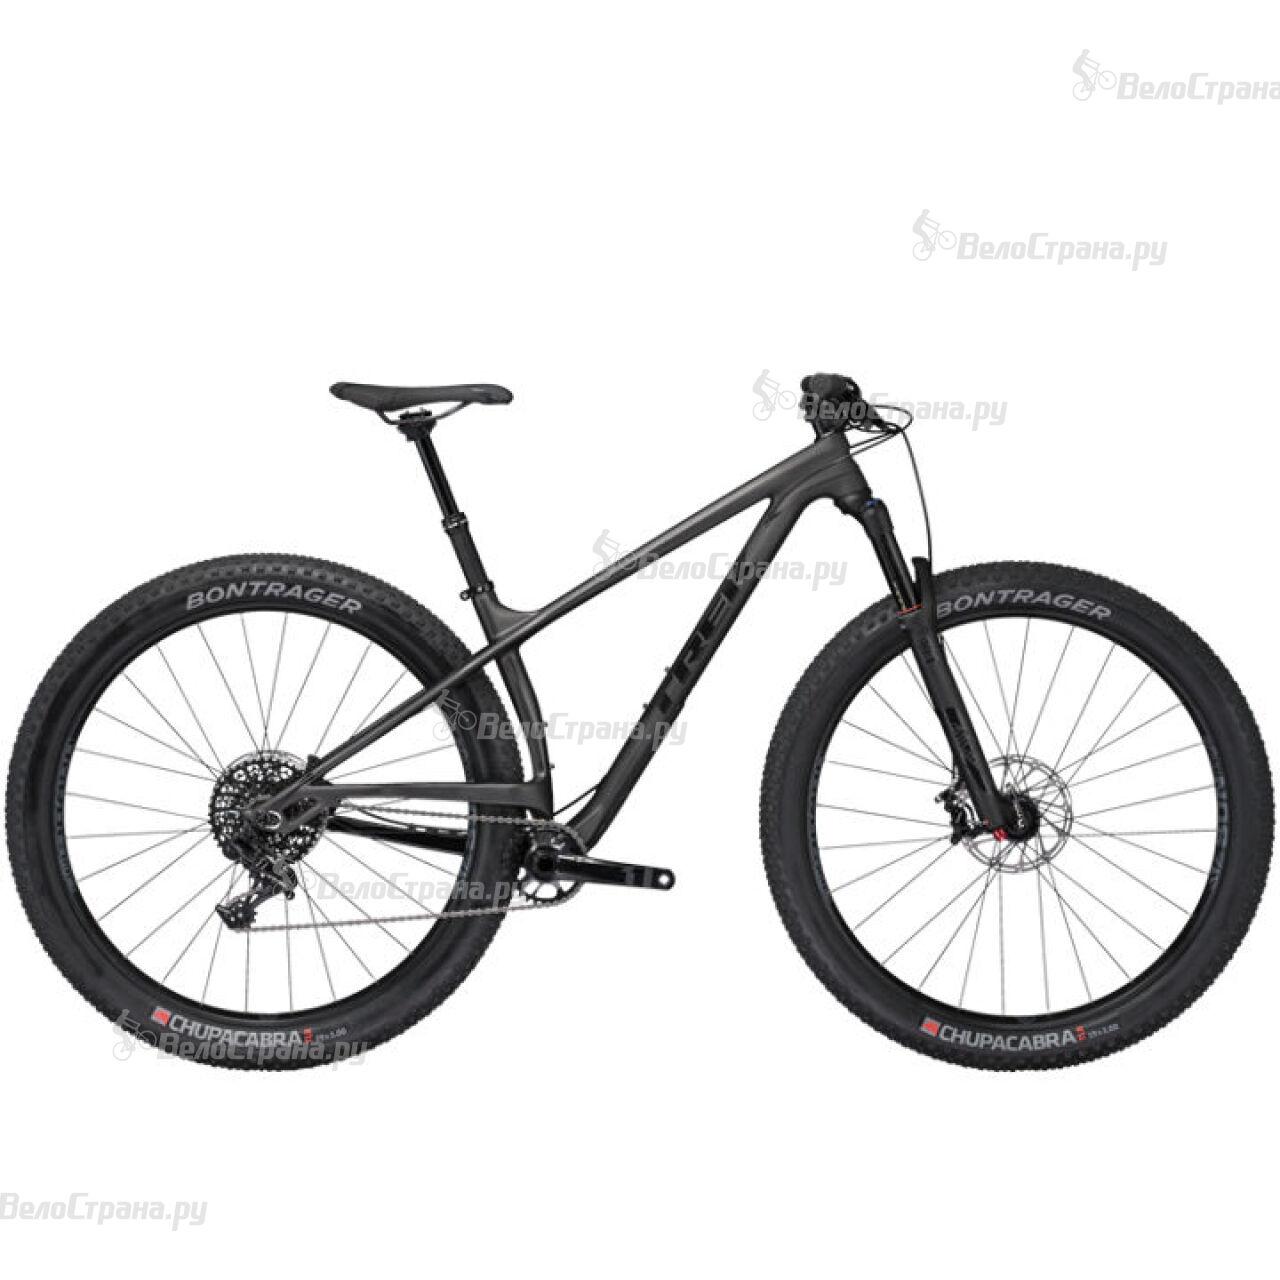 Велосипед Trek Stache 9.6 (2017) trek stache 7 2014